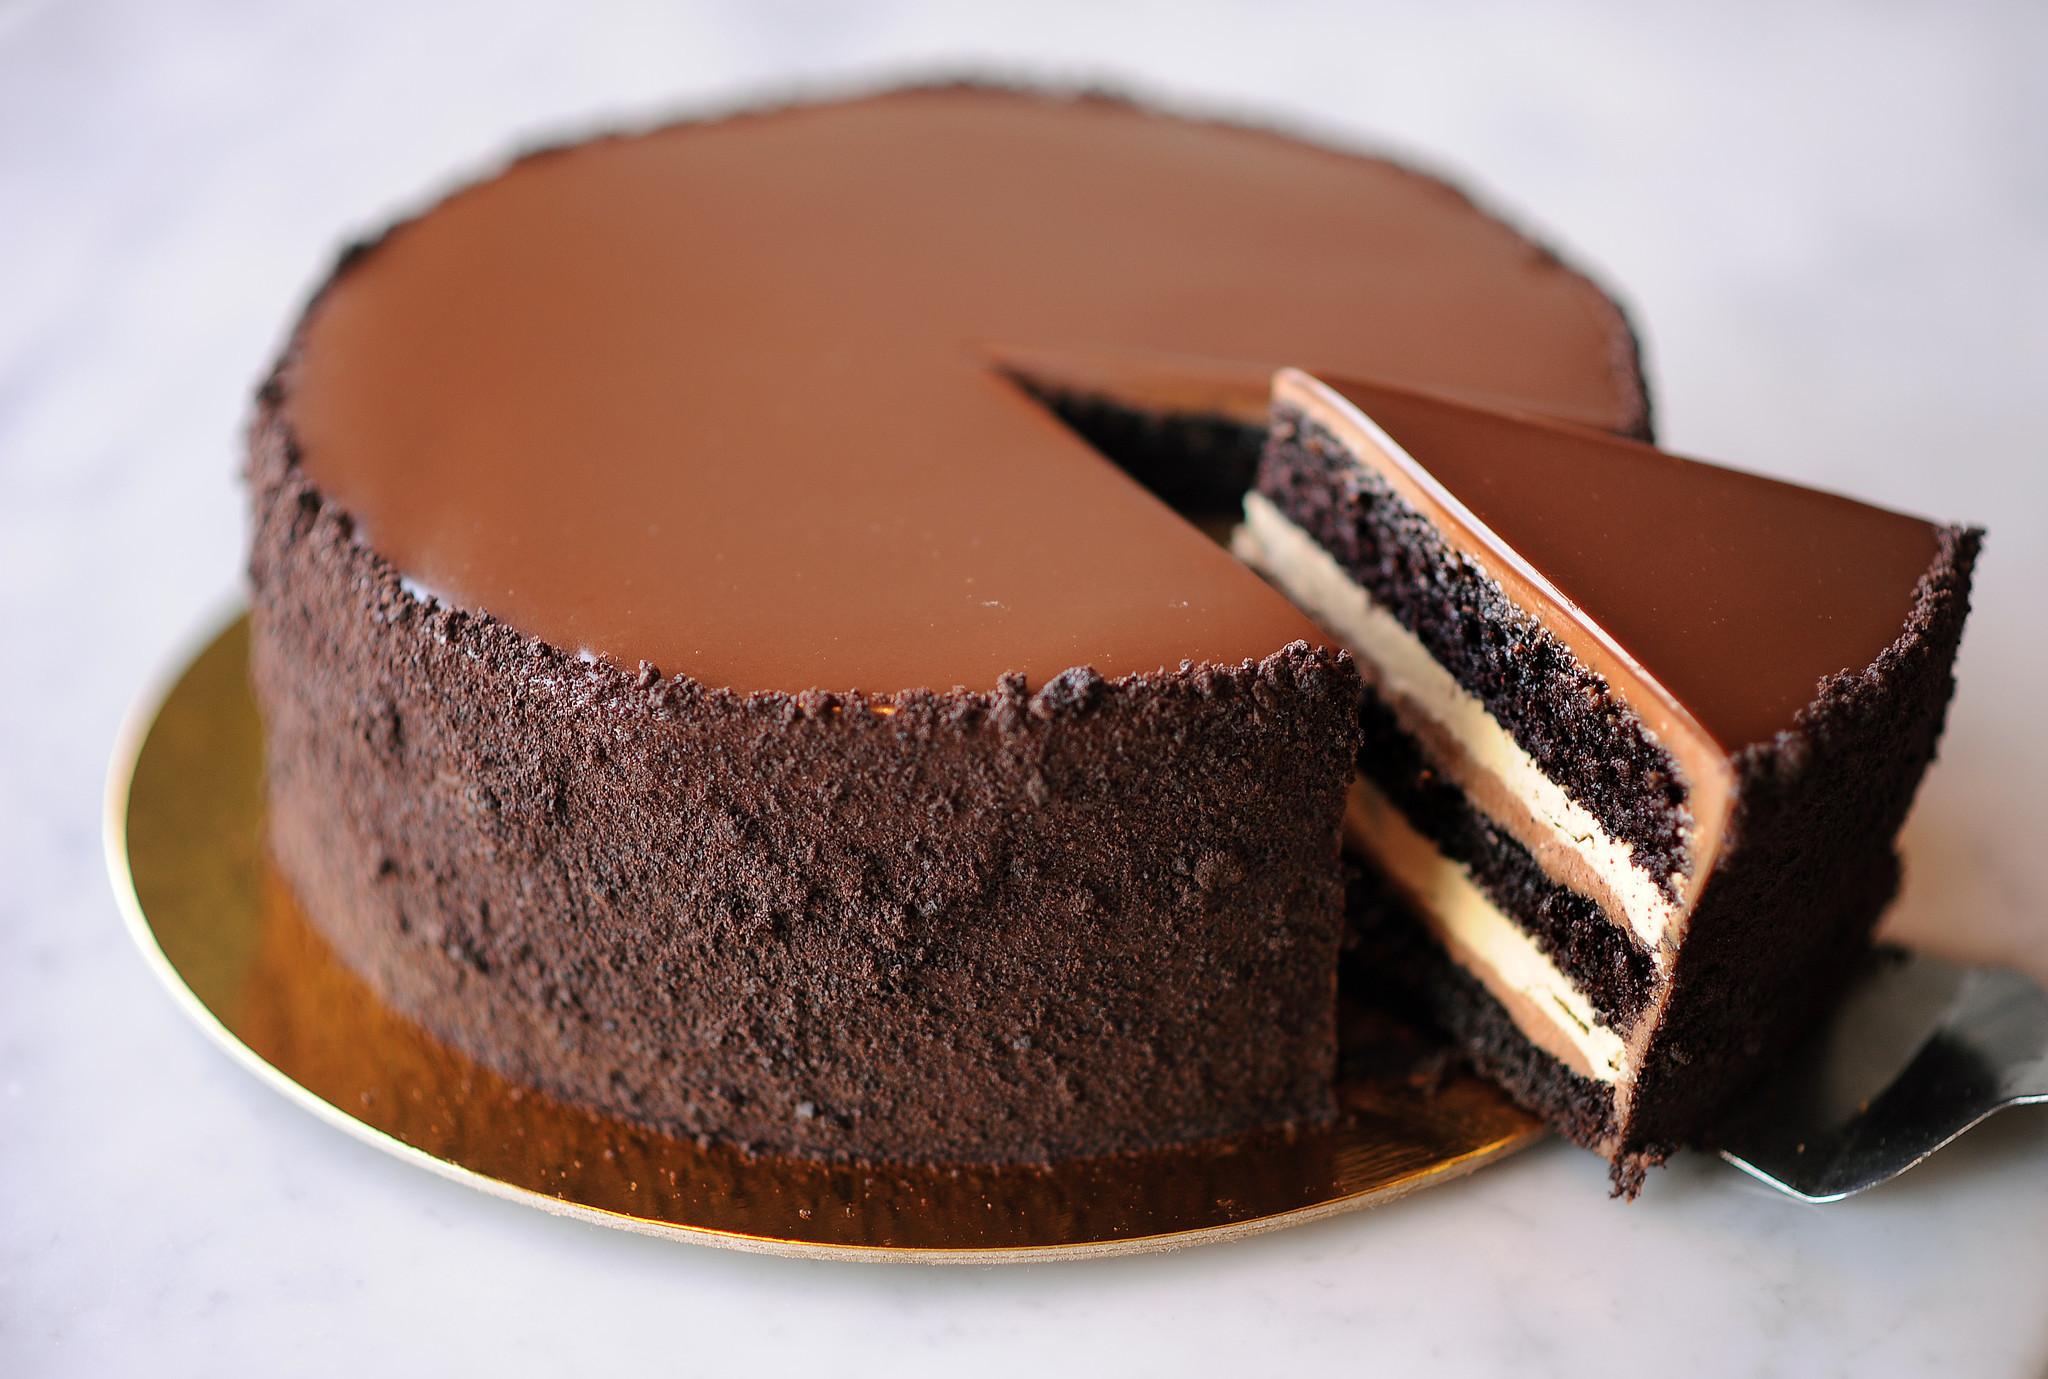 la-fo-proof-chocolate-cake-20160213&f=1